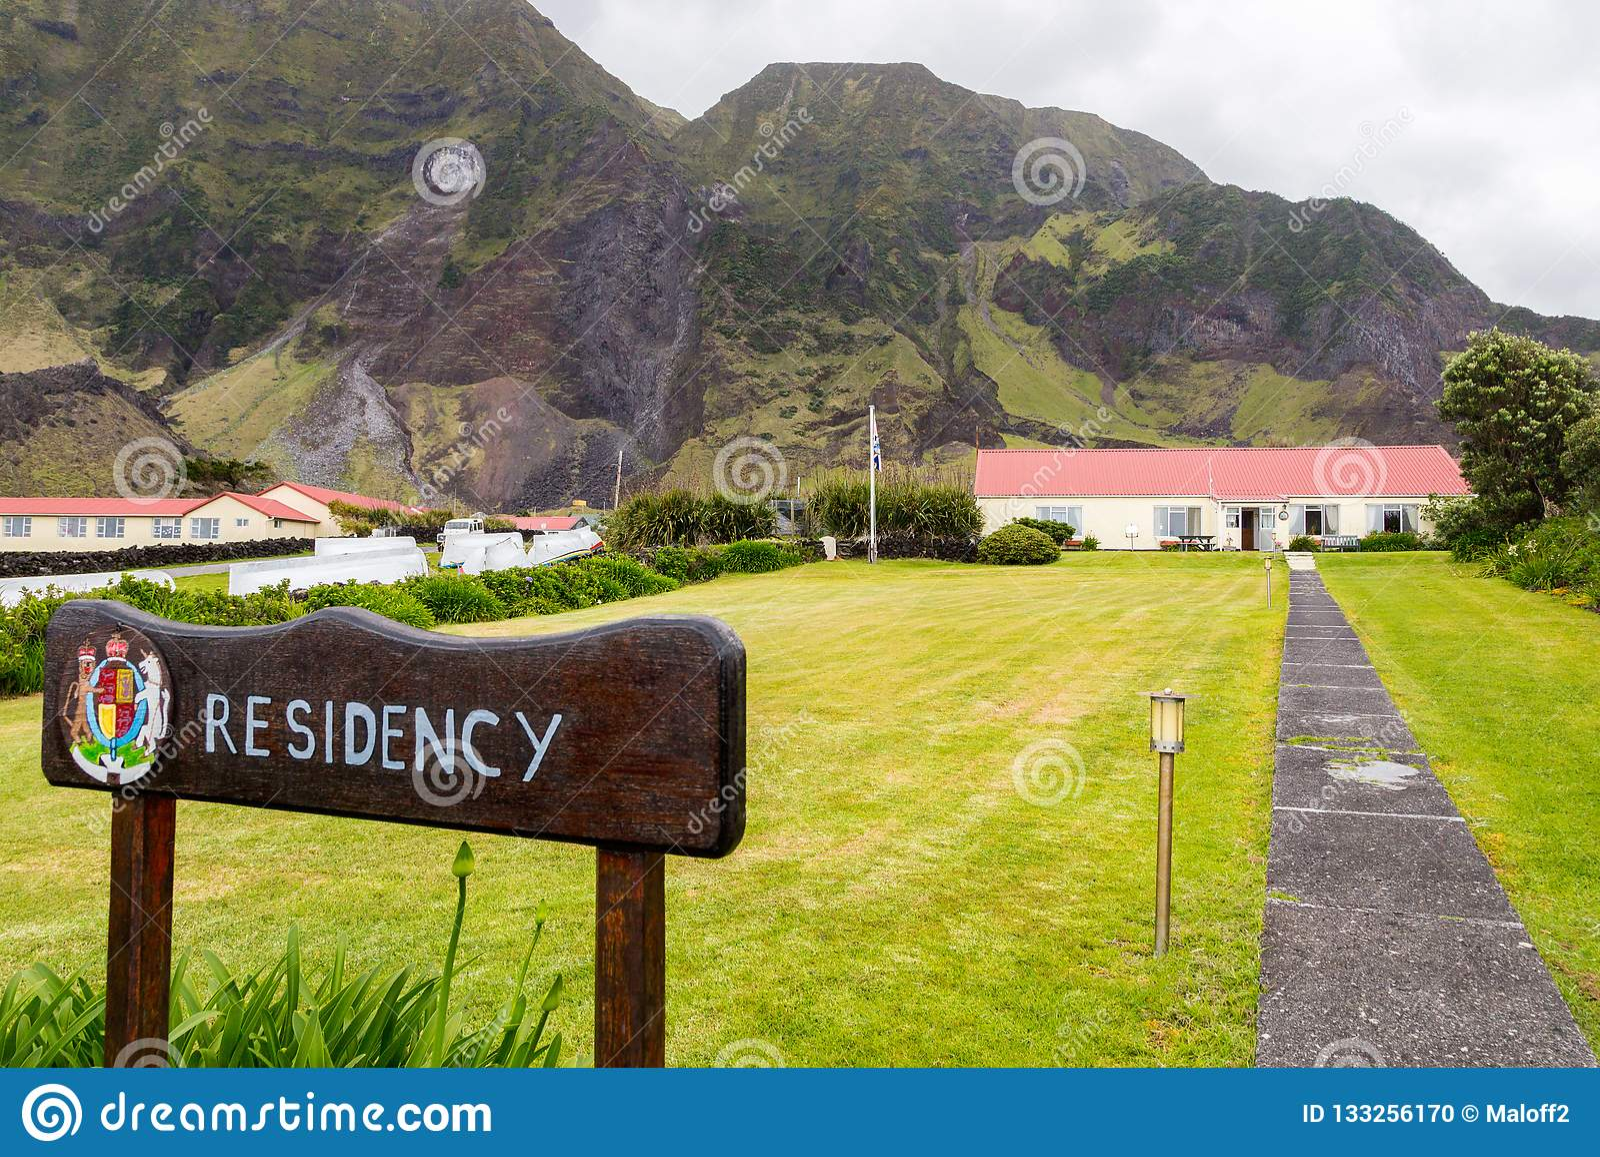 Britischer Gouverneursitz, Wegweiser, Wappen Edinburgh der sieben Seestadt, Tristan da Cunha-Insel, Südatlantik